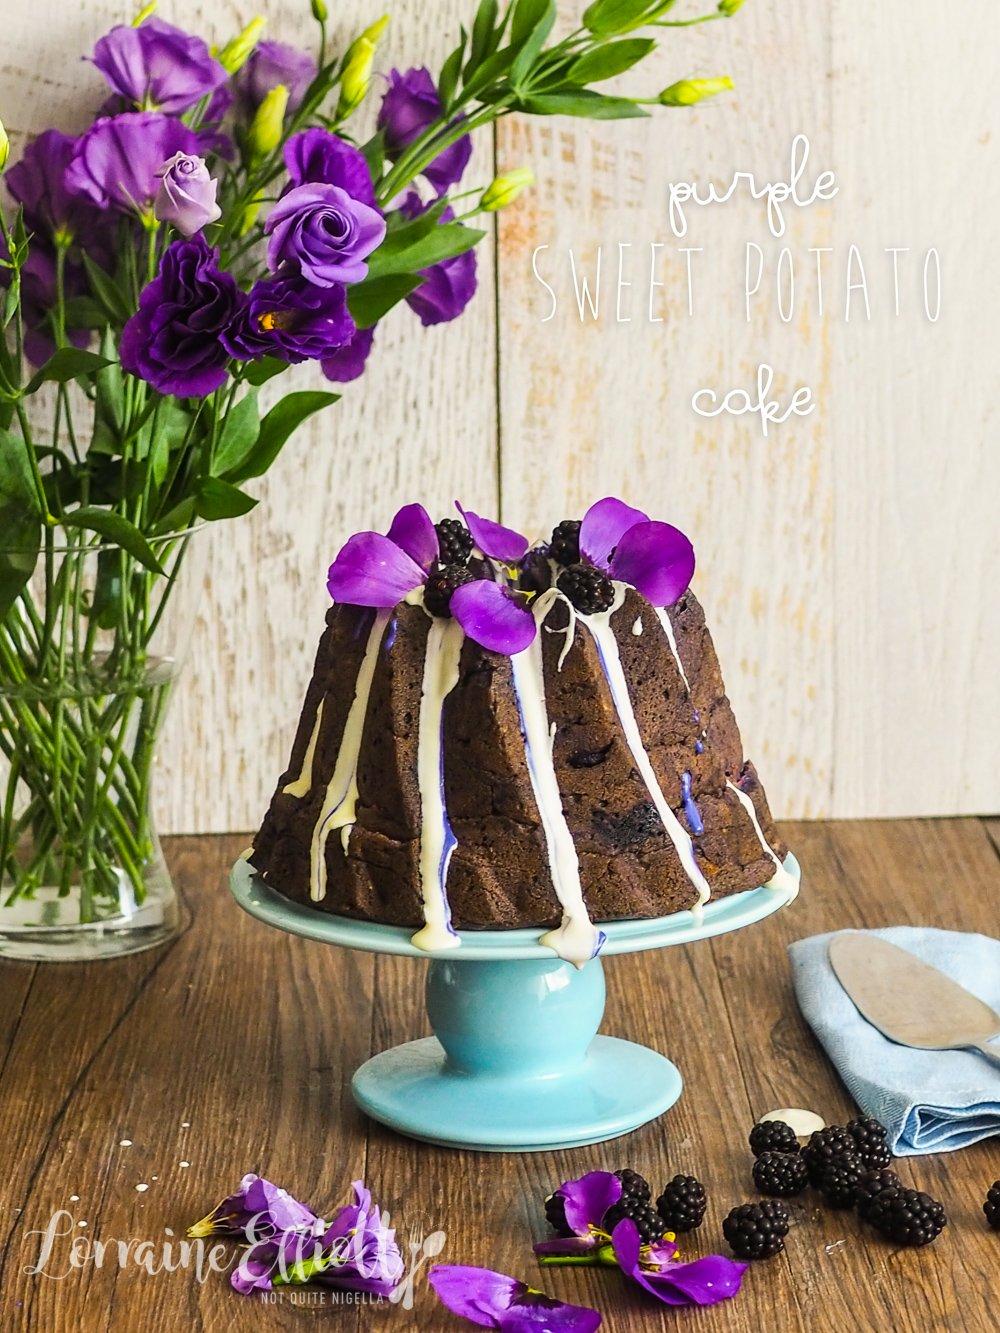 Ube Purple Sweet Potato Cake Recipe